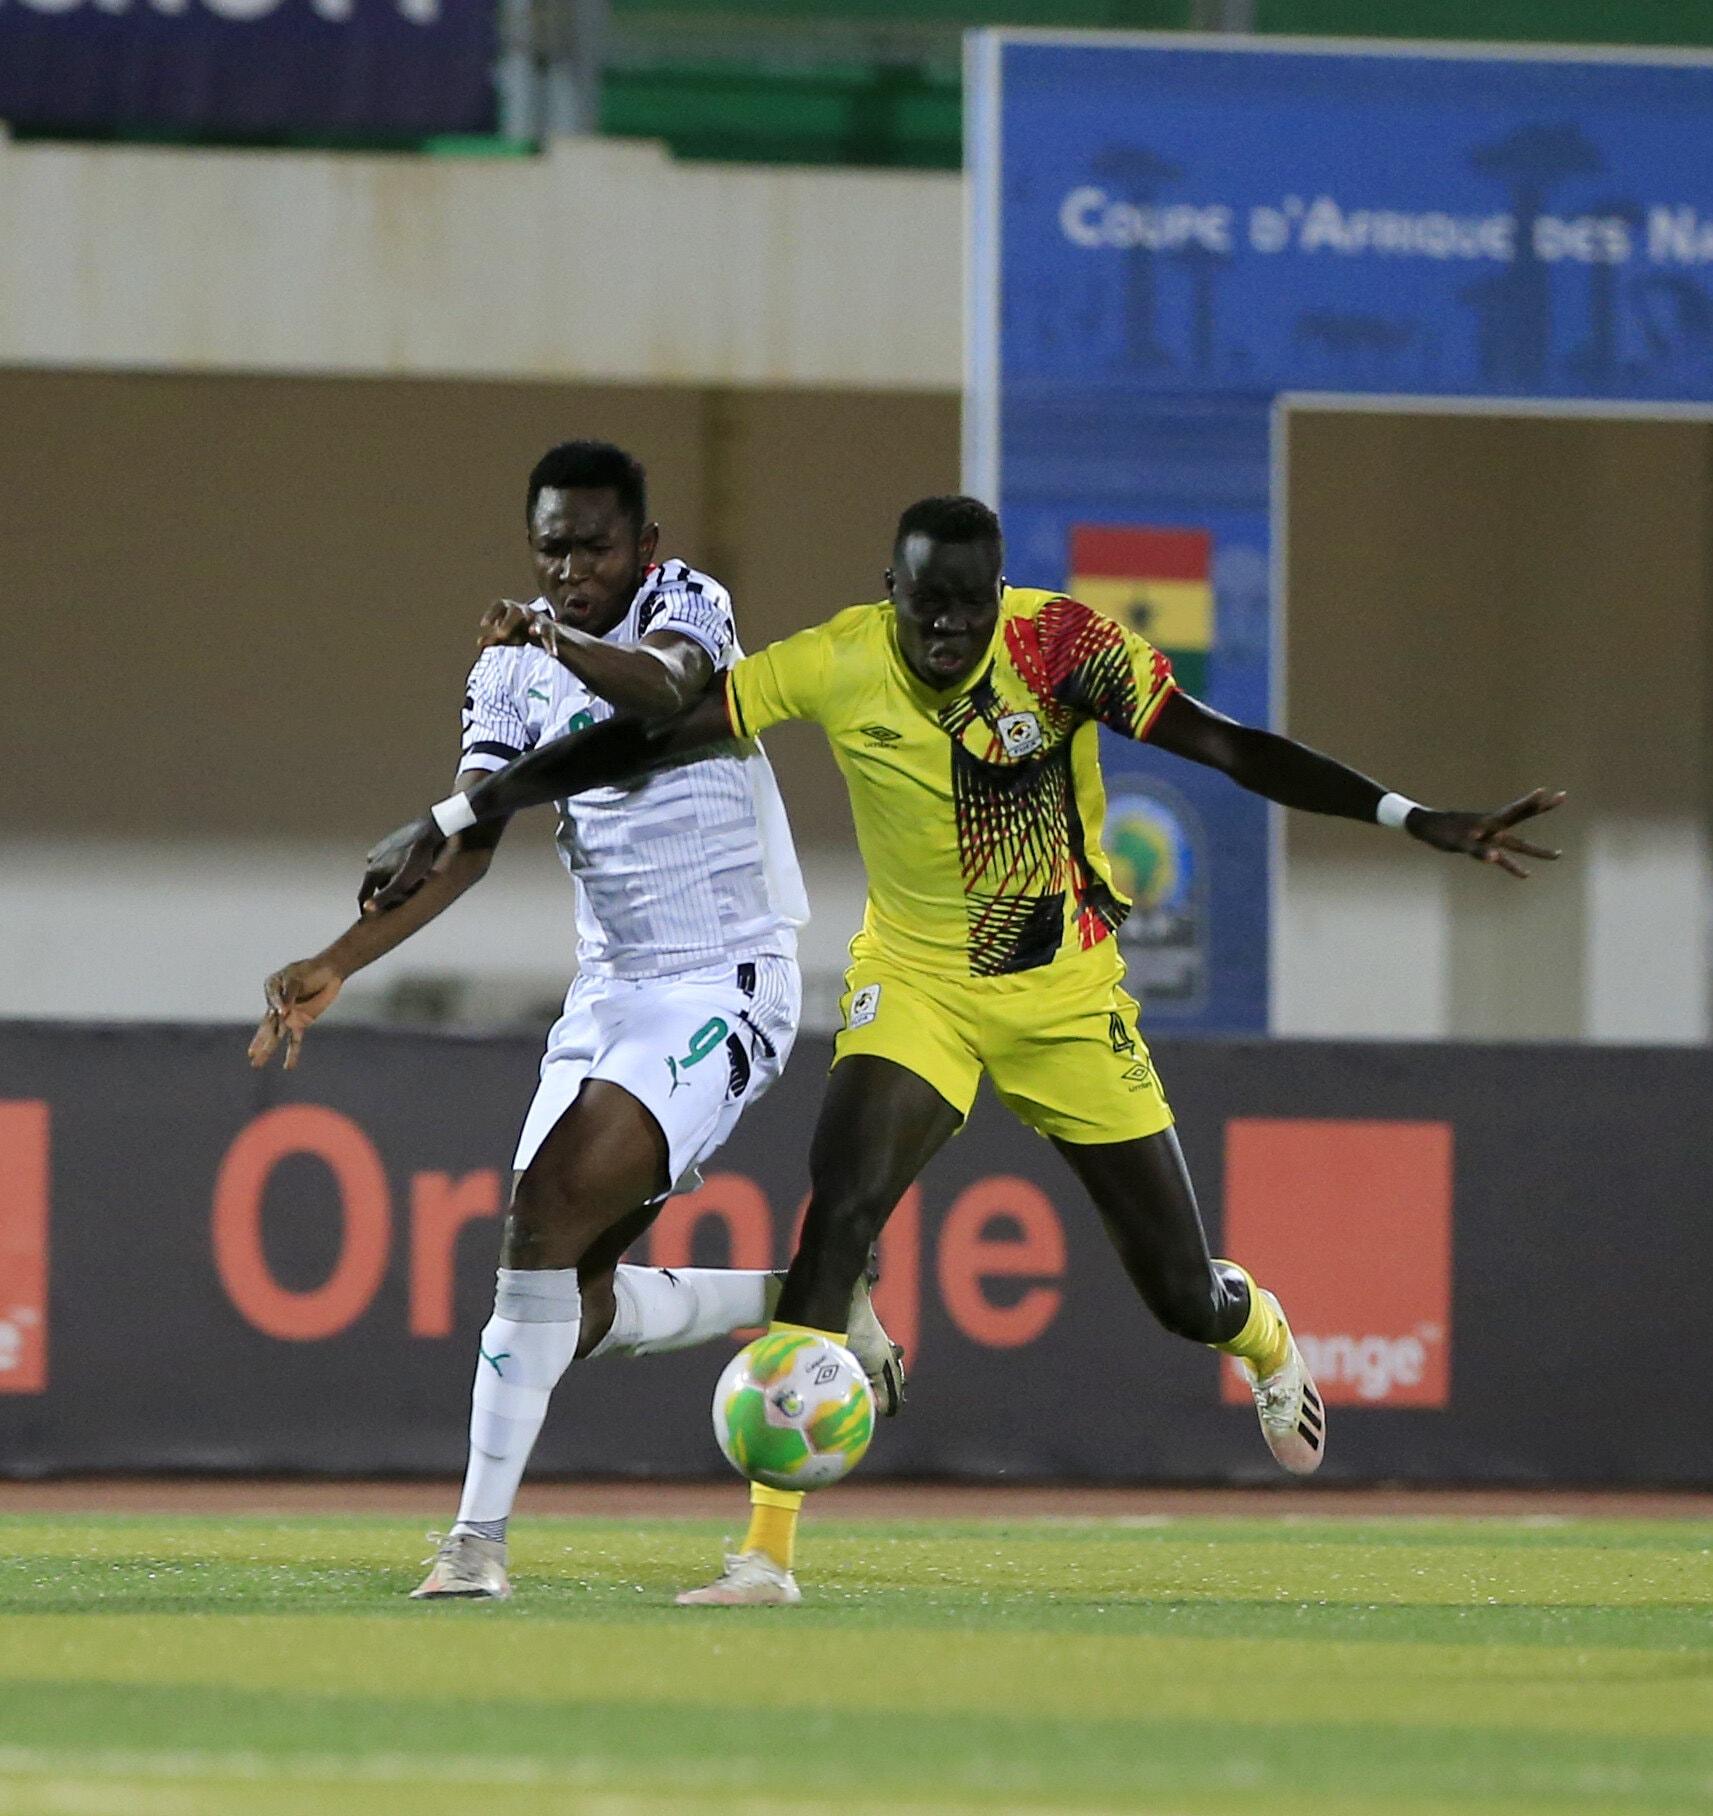 Afcon U20: Ghana beat Uganda to claim 4th title - The Ghana Report